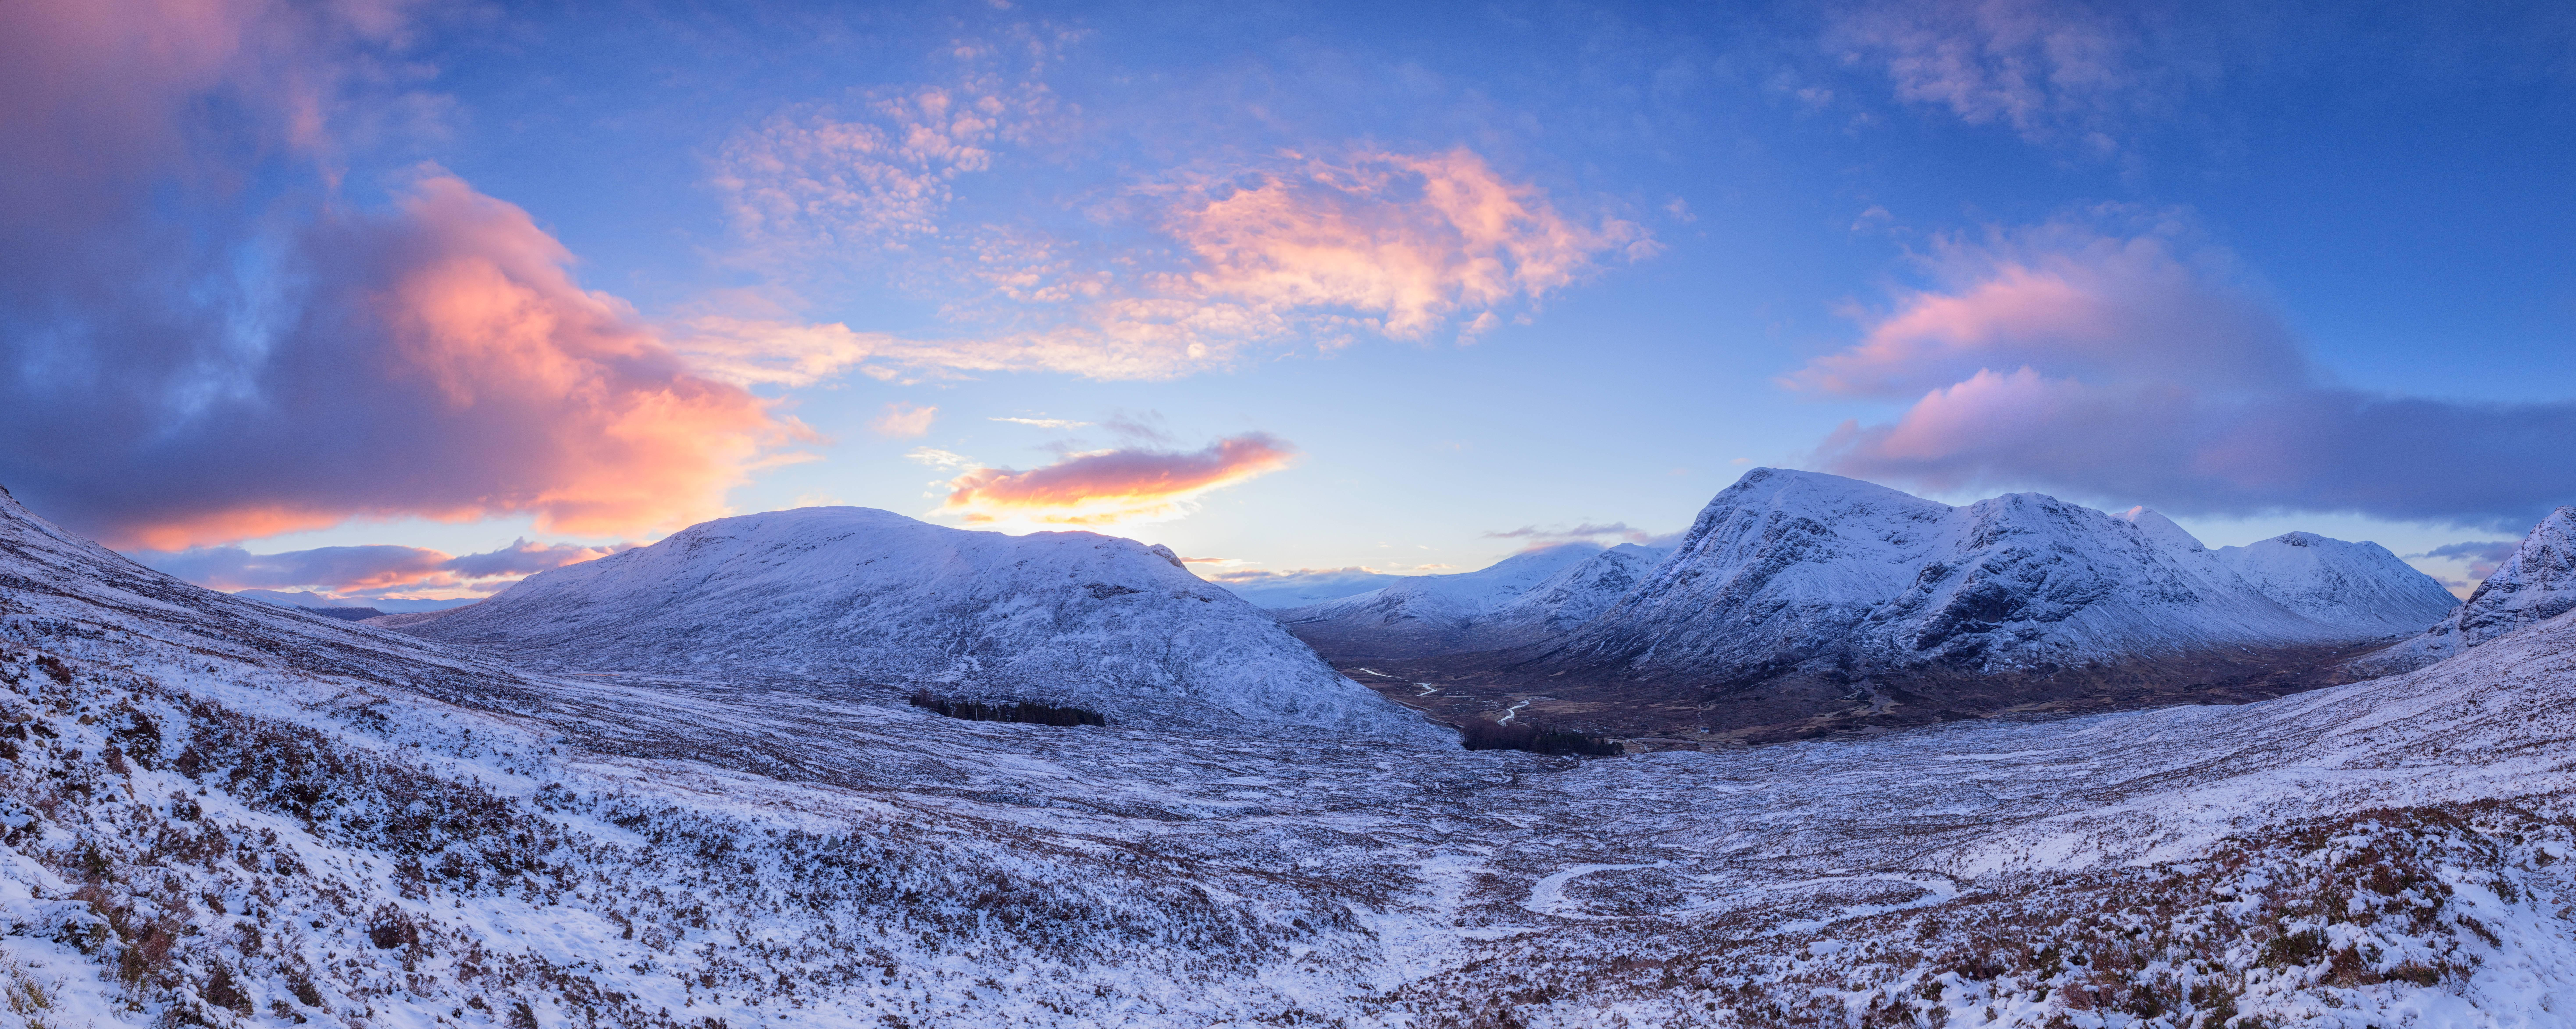 Free Images : nature, snow, winter, cloud, sunrise, sunset, dawn, mountain range, weather ...